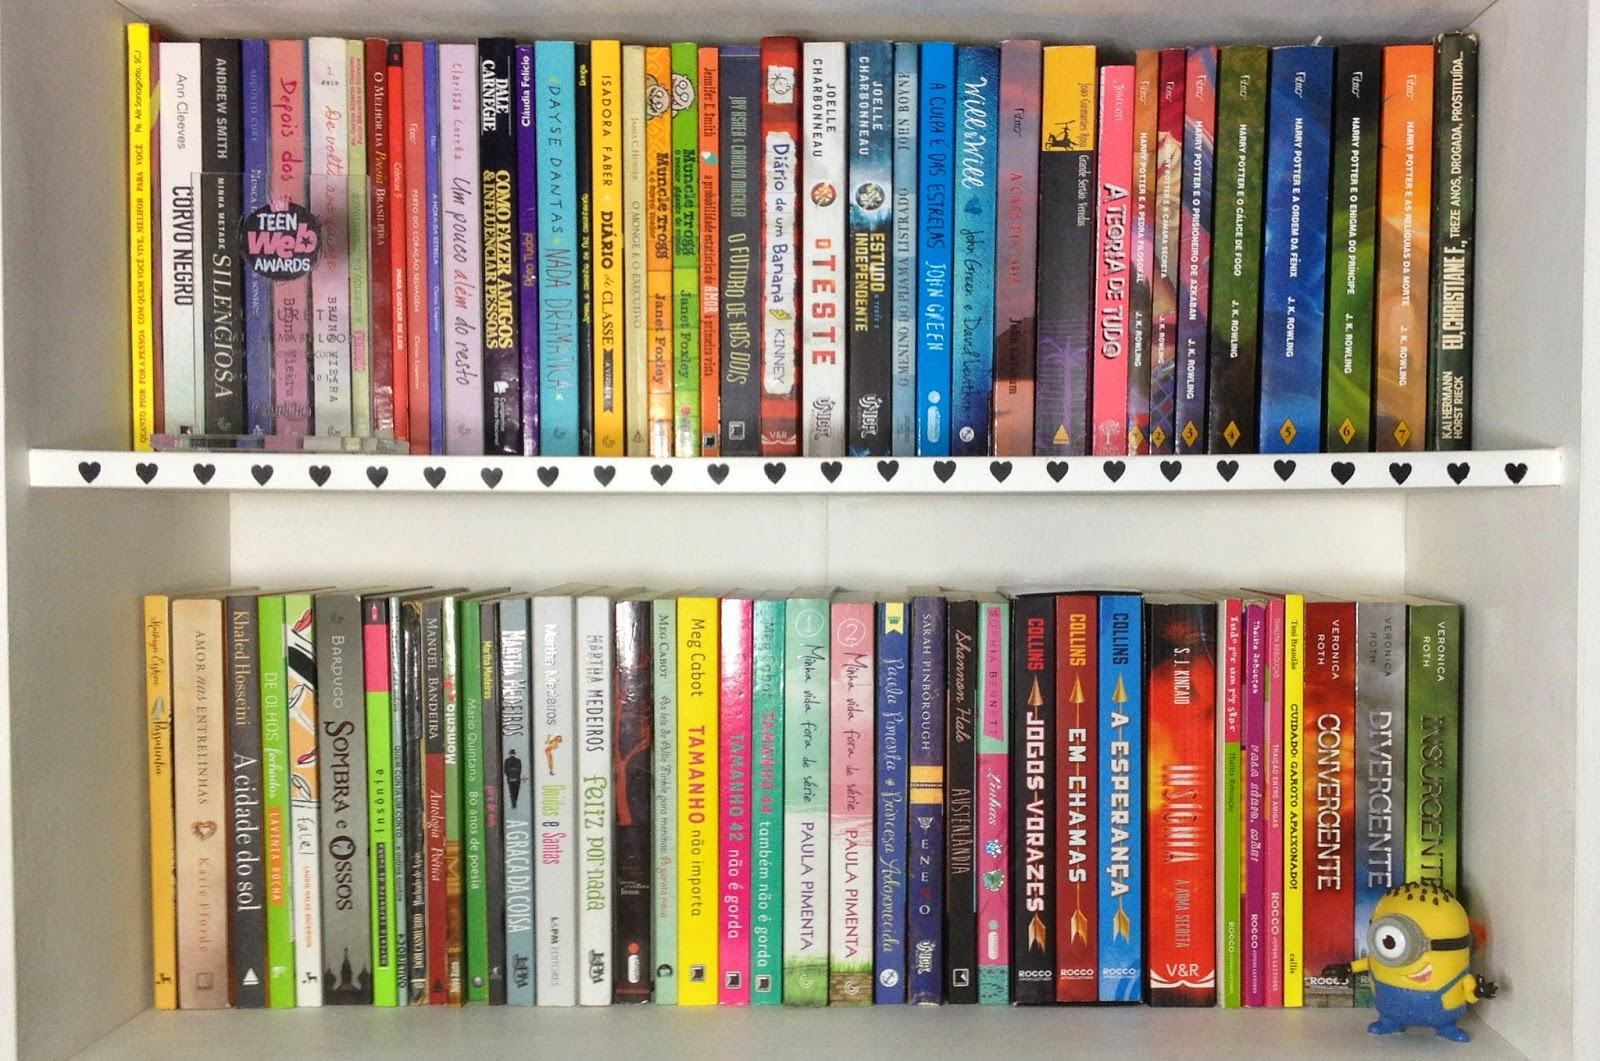 Desejo Adolescente: Dicas para limpar Livros & Estantes #BAA011 1600x1061